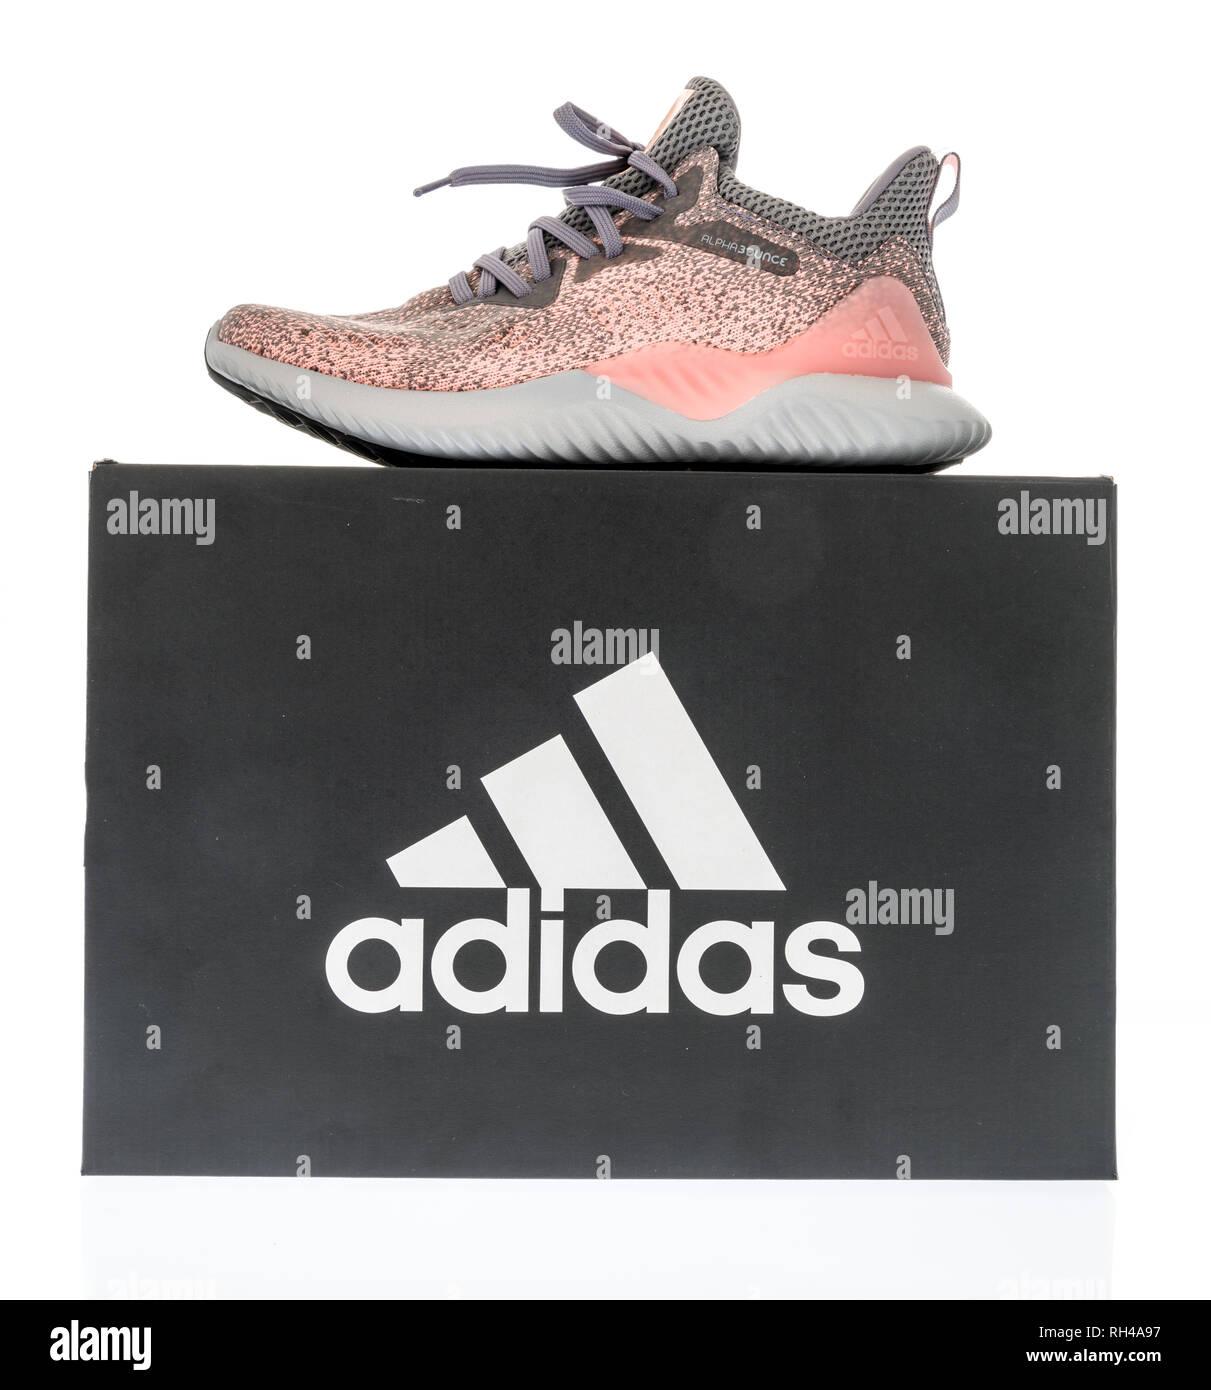 28 À Chaussures Boîte Janvier 2019Une Adidas WinneconneWi 453ARLqj